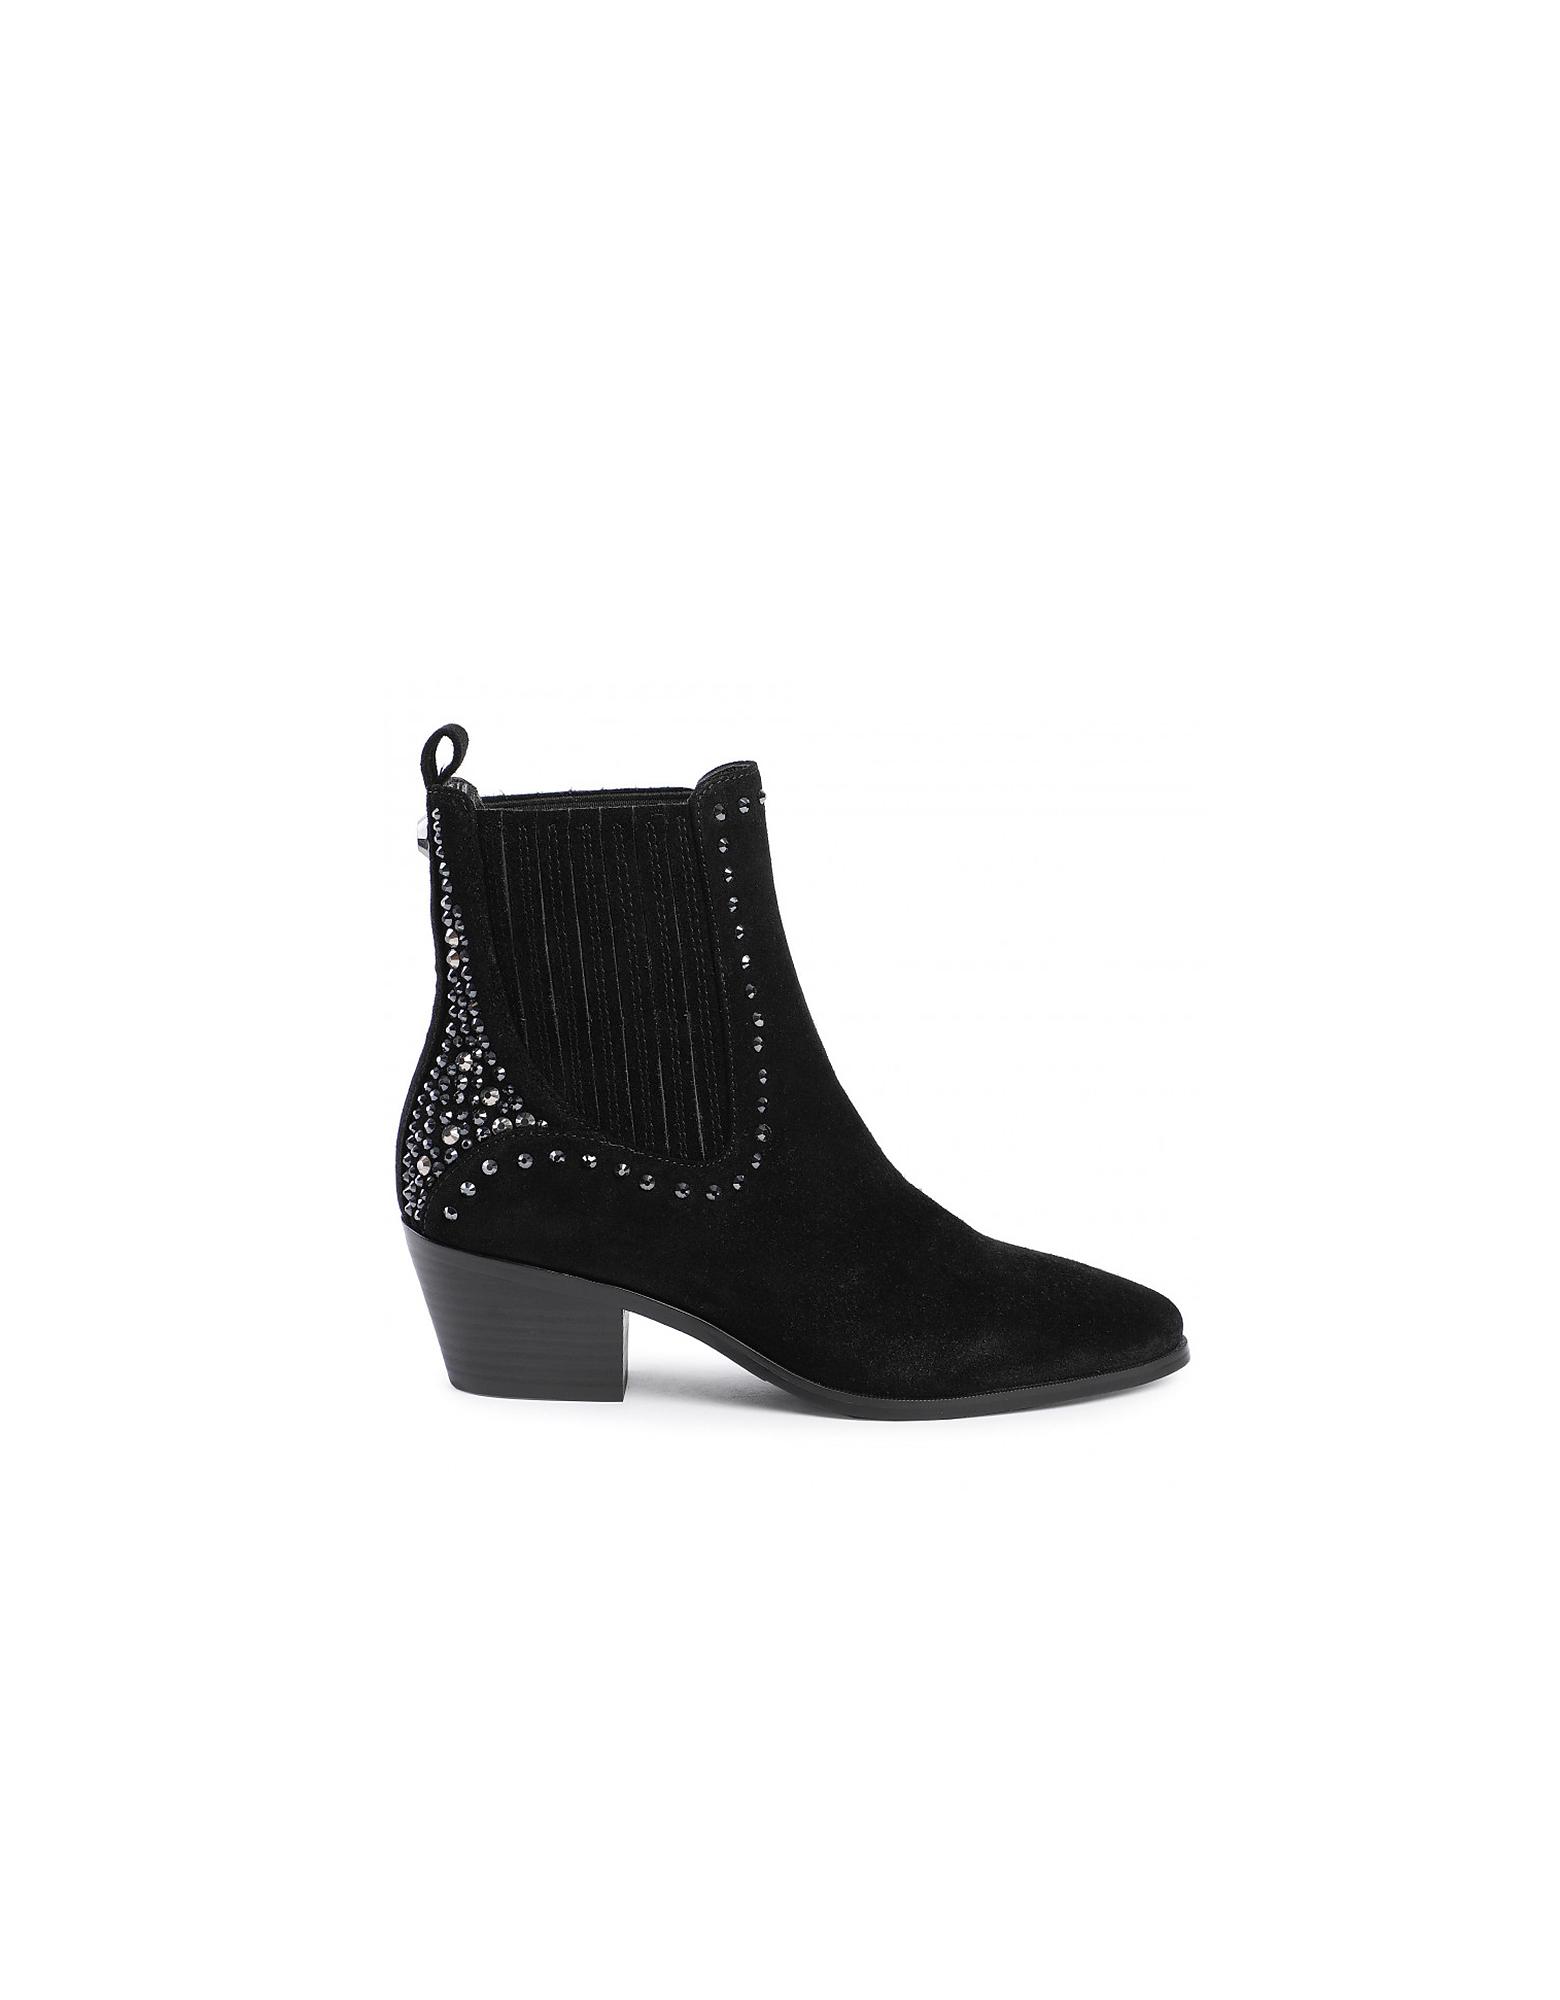 Liu Jo Designer Shoes, Women's Black Shoes